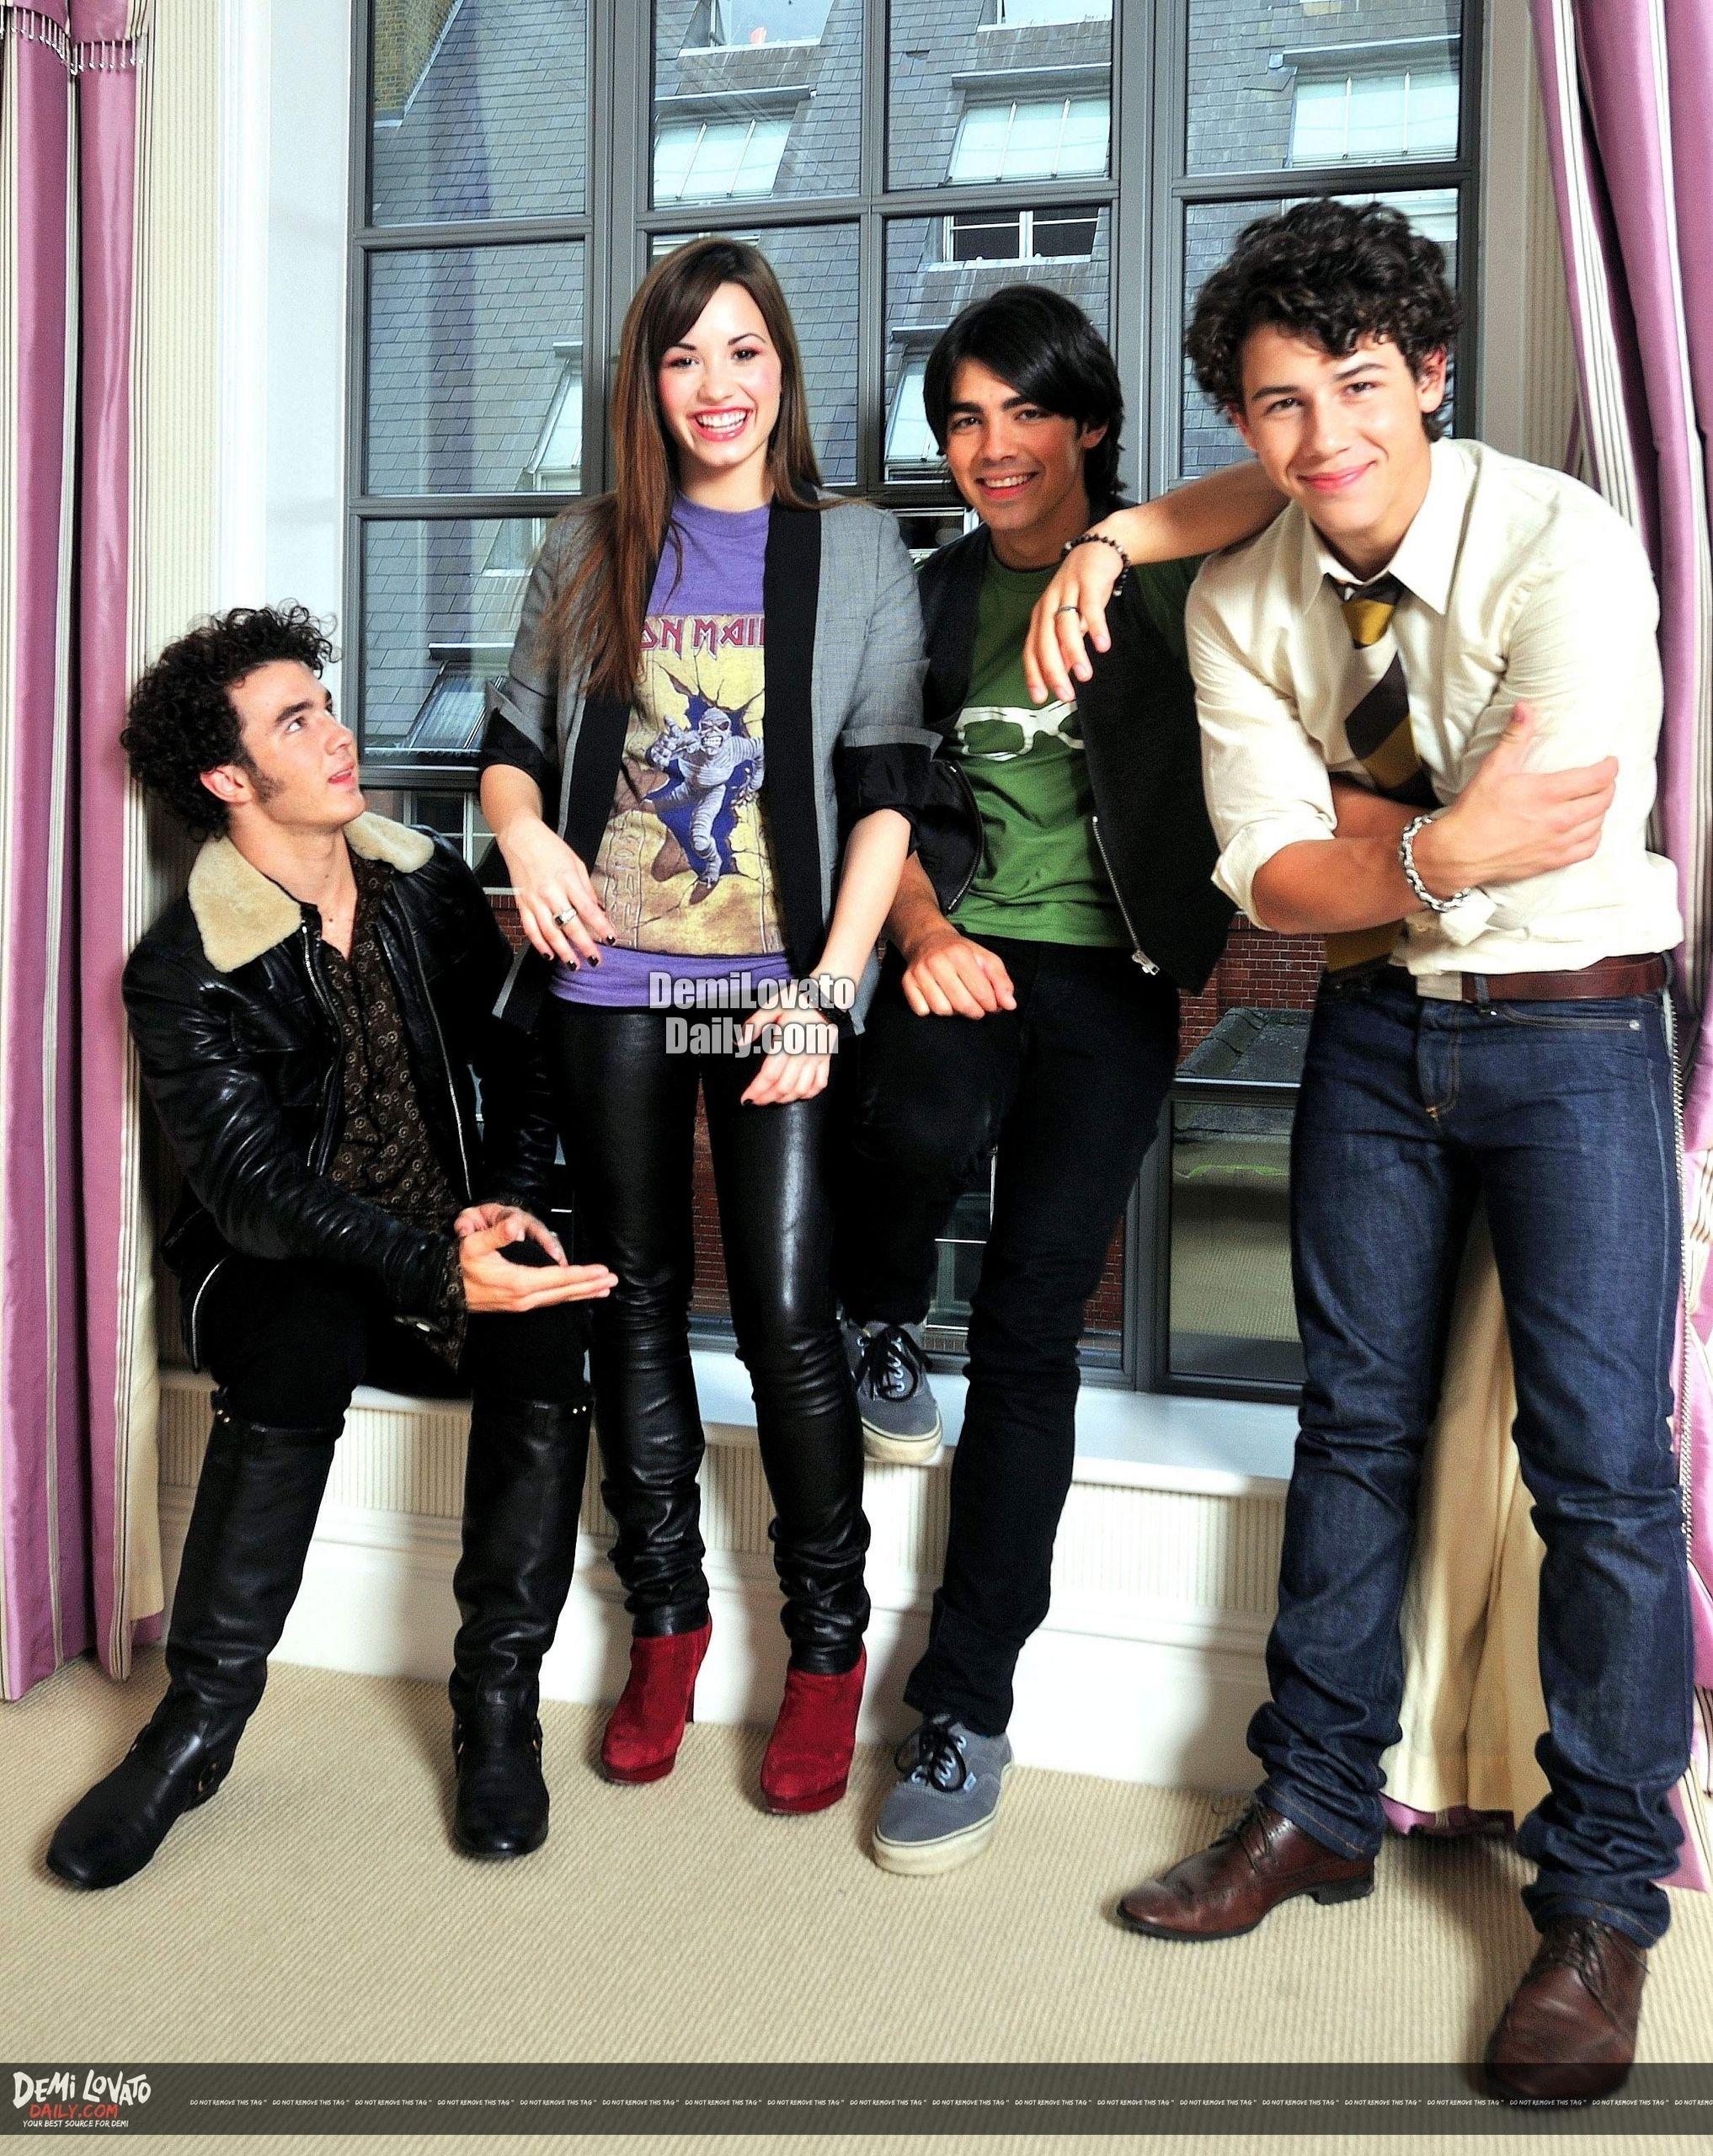 Jonas Brothers Demi Lovato A Long Time Ago Wow Look At Their Cute Little Faces Jonas Brothers Demi And Joe Jonas